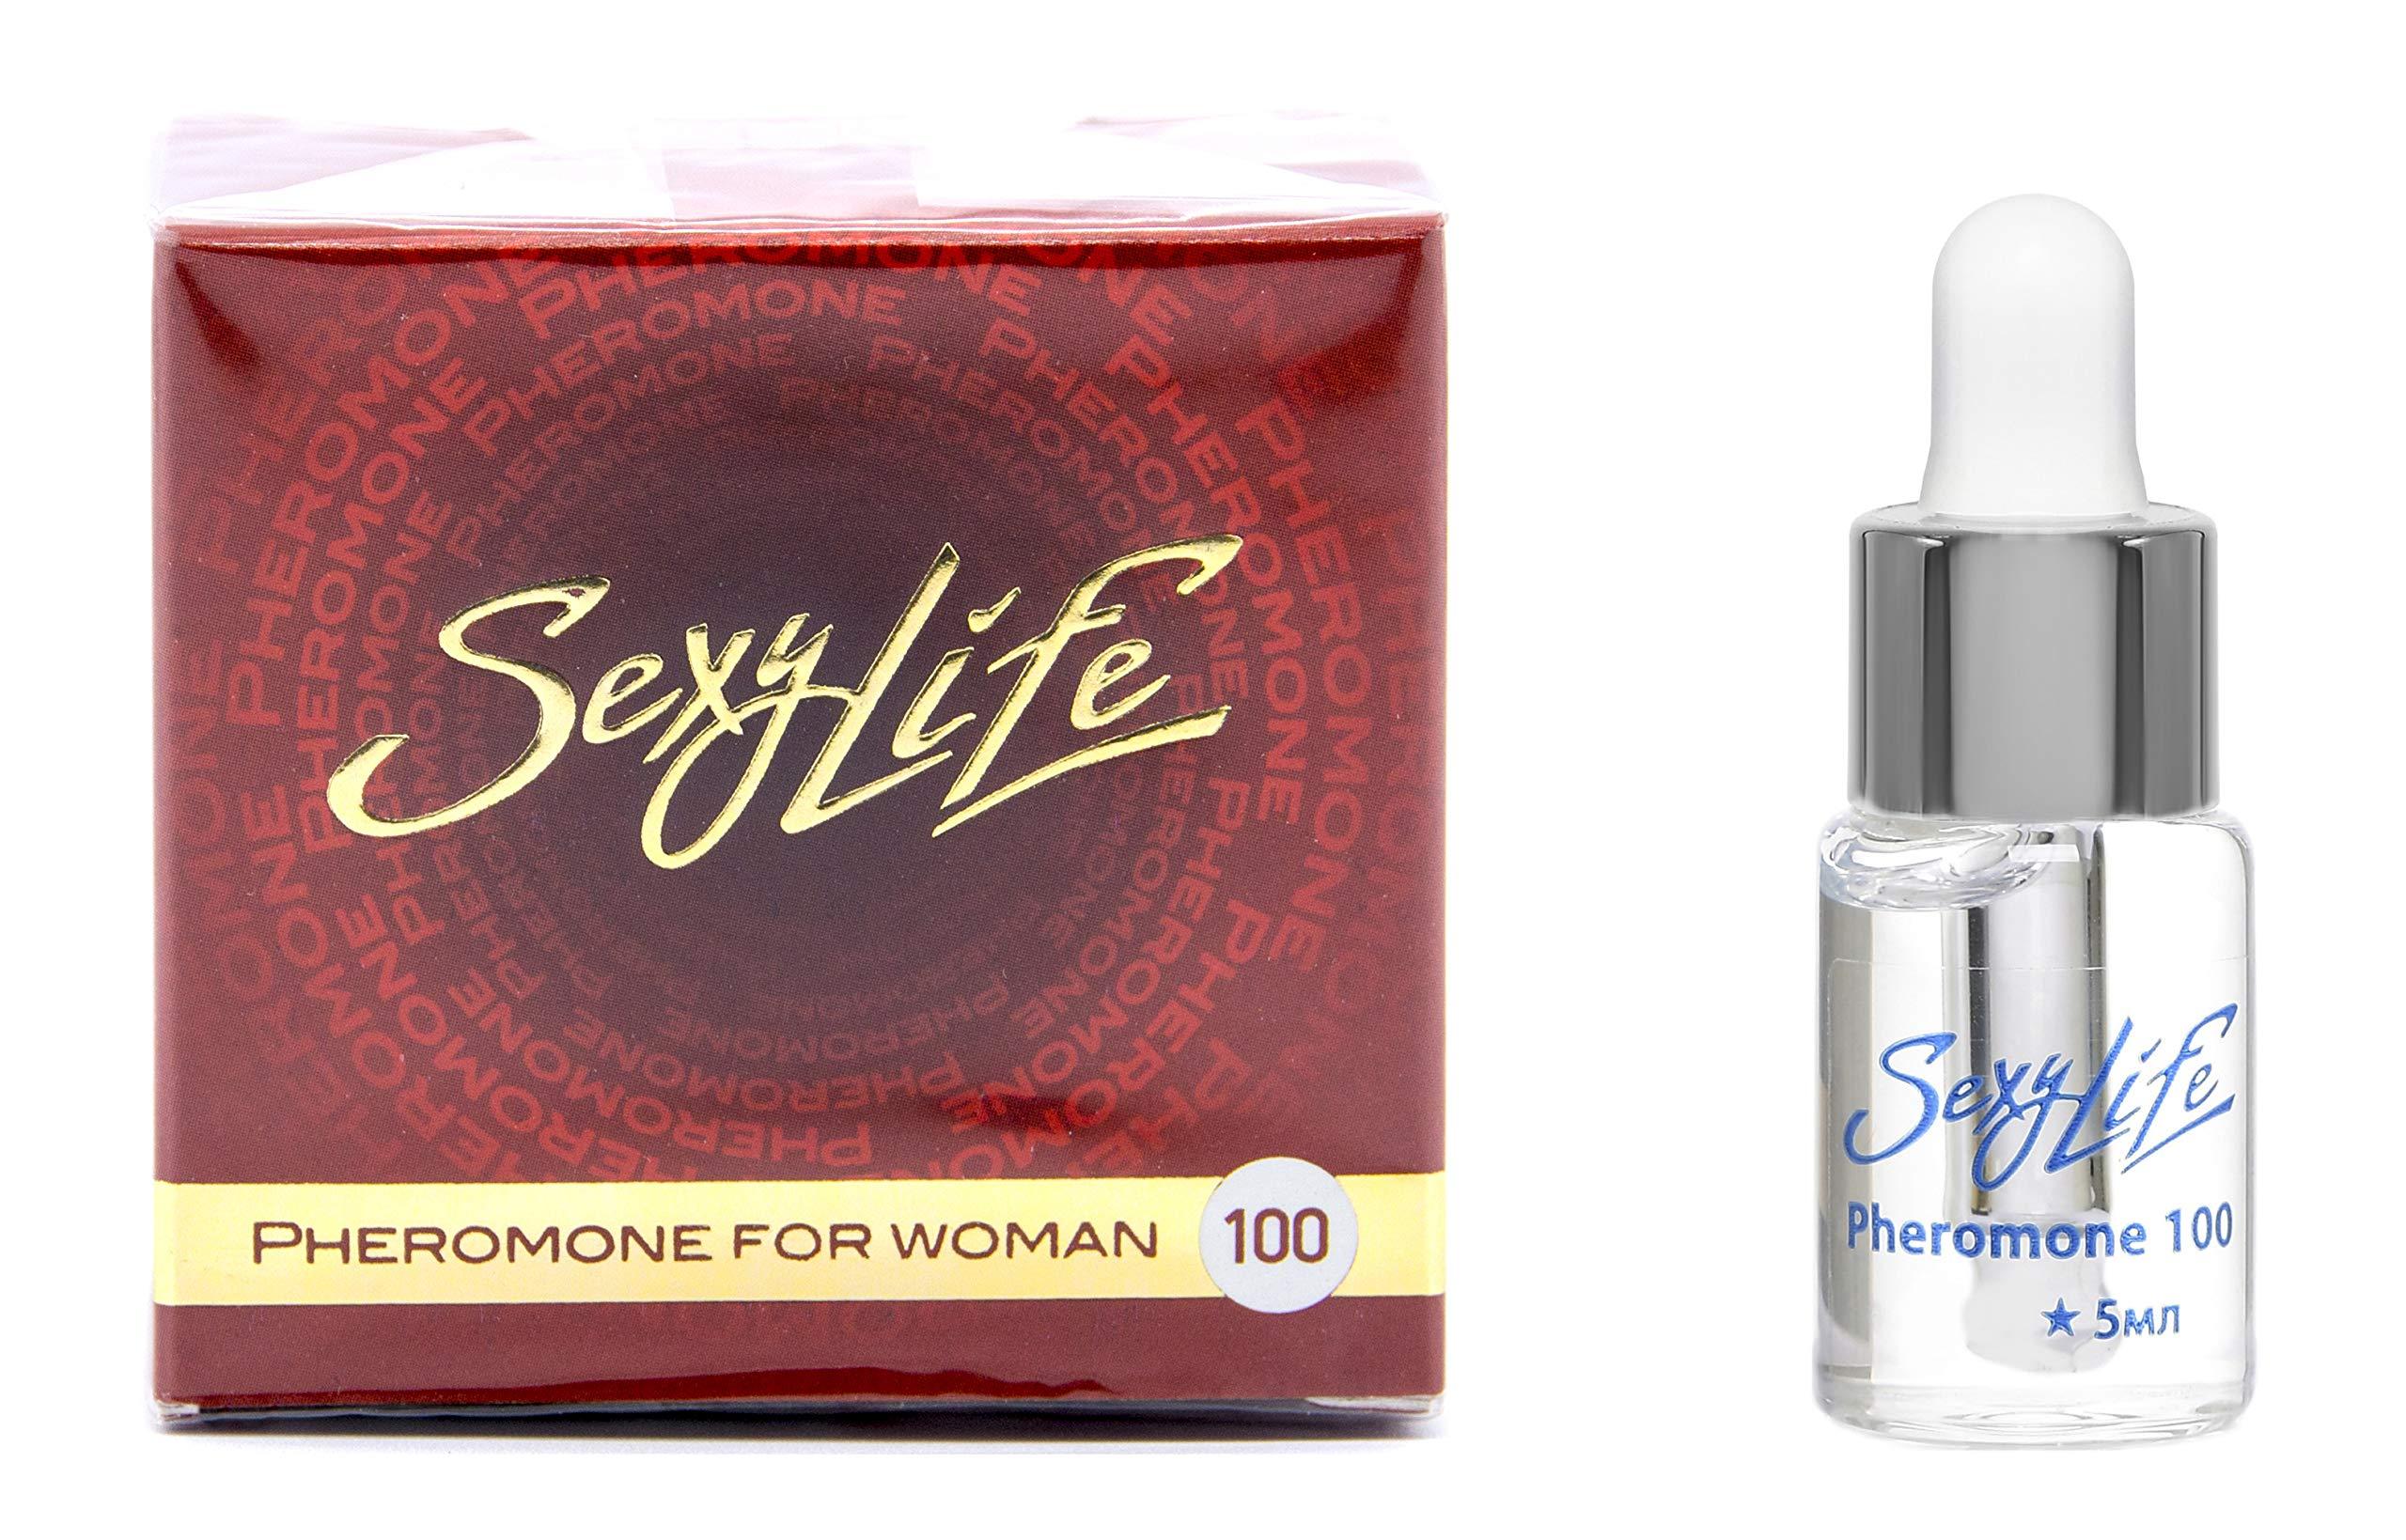 Sexy Life Pheromones for Women Pheromone Perfume [Attract Men] - Extra Strength Human Pheromones 100 Percent Concentrate, Harmony of Aphrodisiacs & Pheromone (5ML Concentrate)